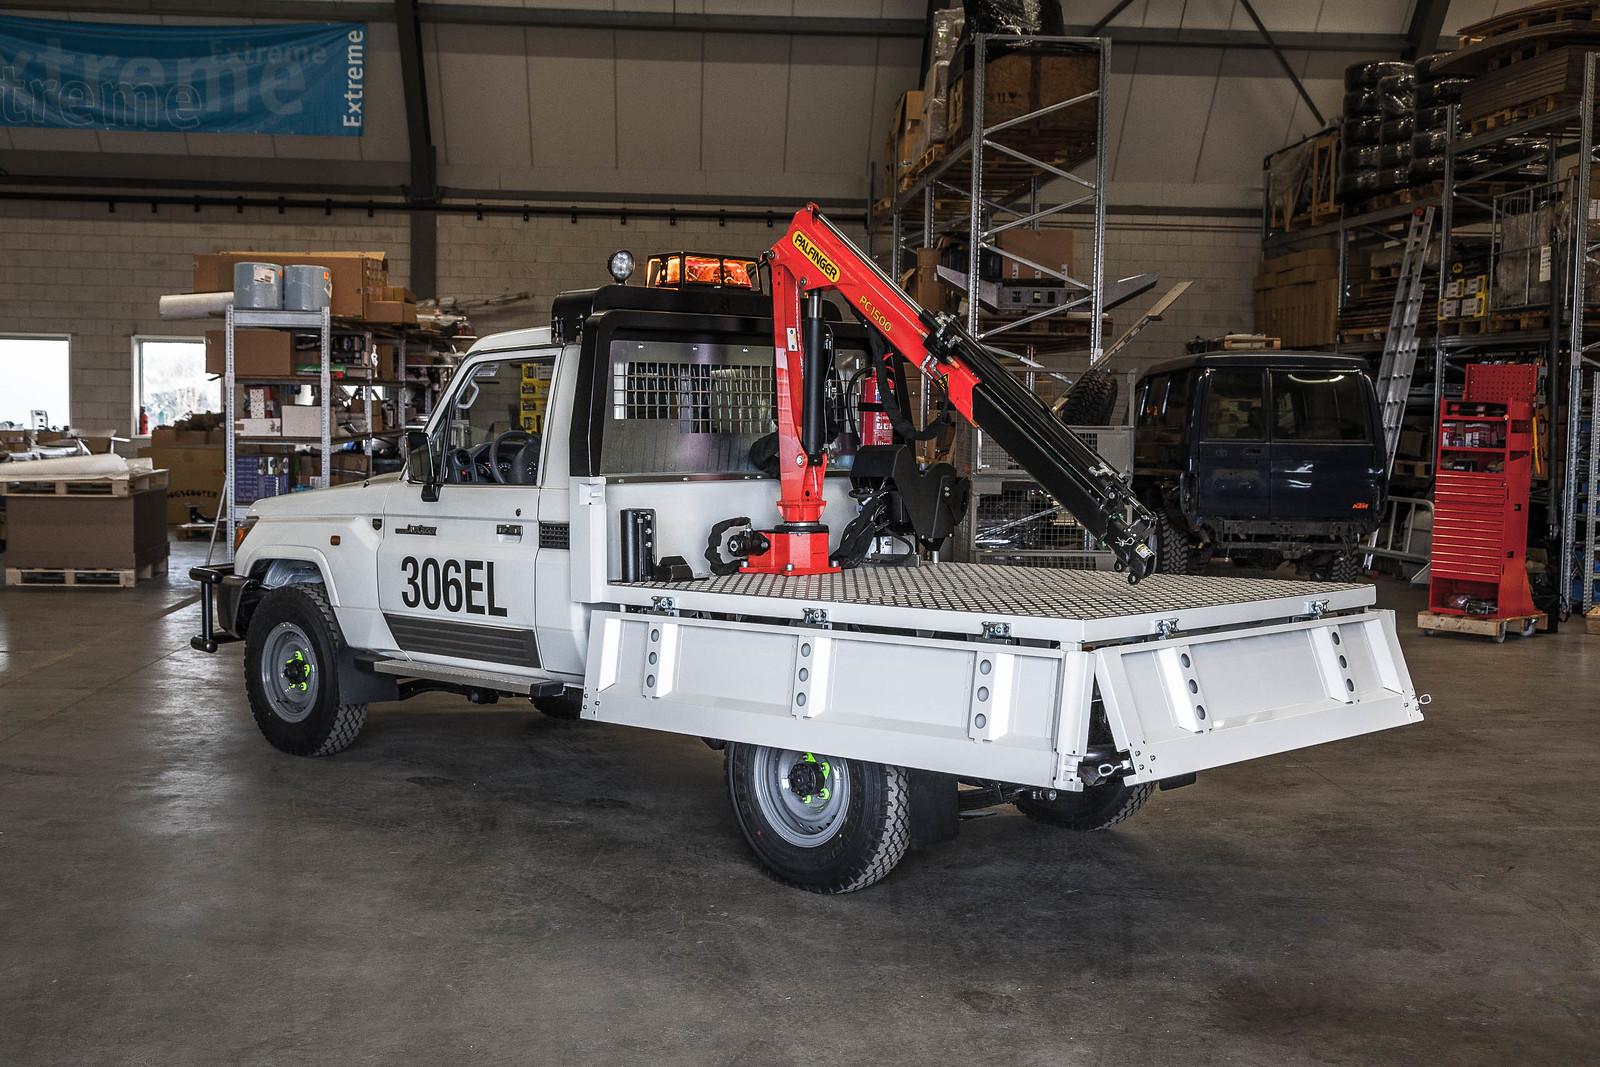 Mining vehicle with crane